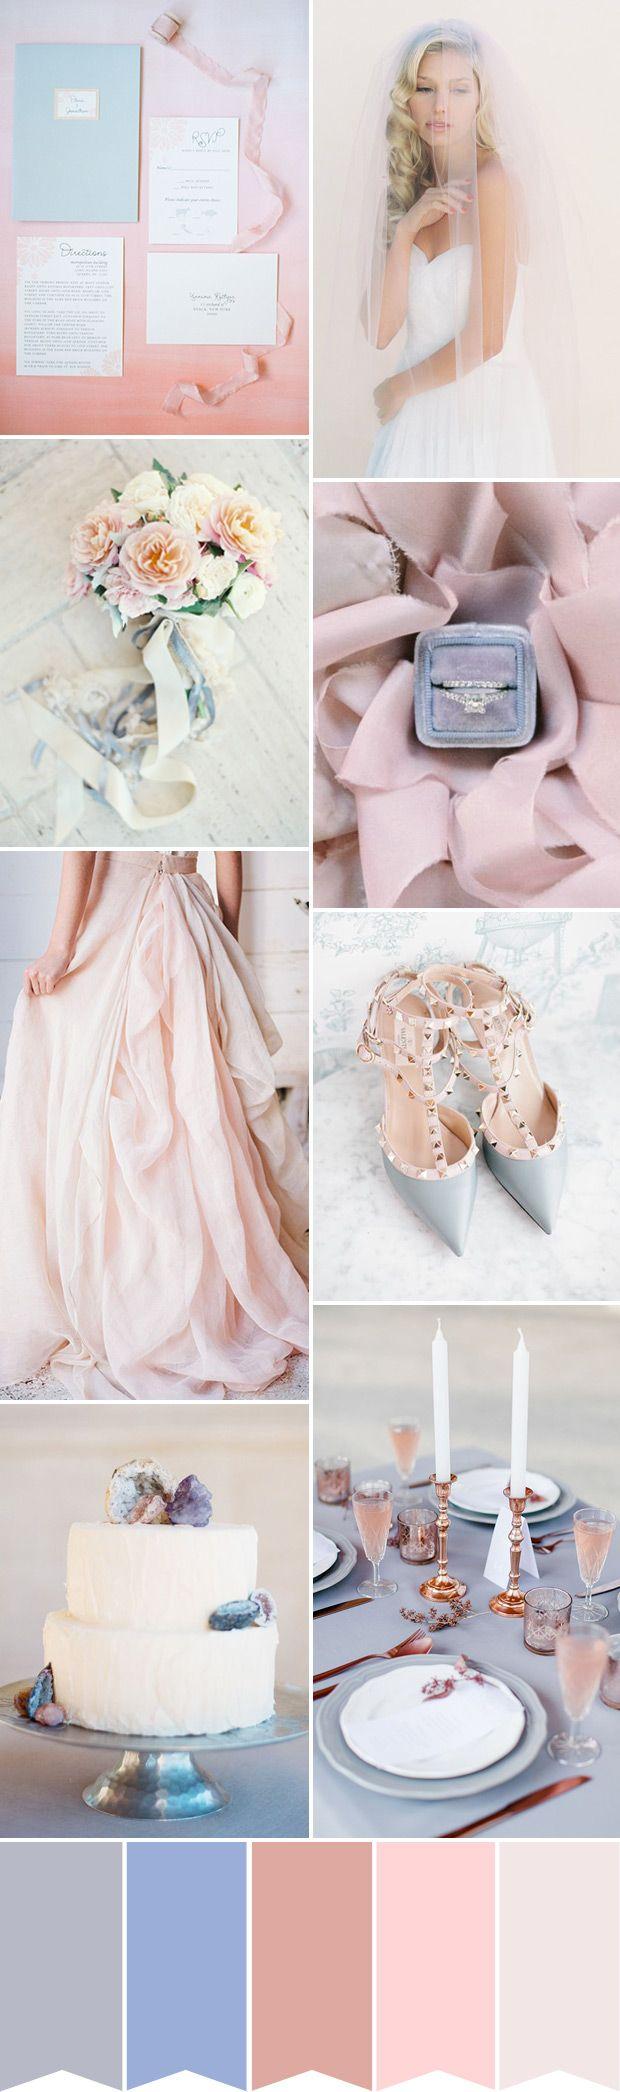 823 best Wedding Inspiration images on Pinterest | Wedding ideas ...